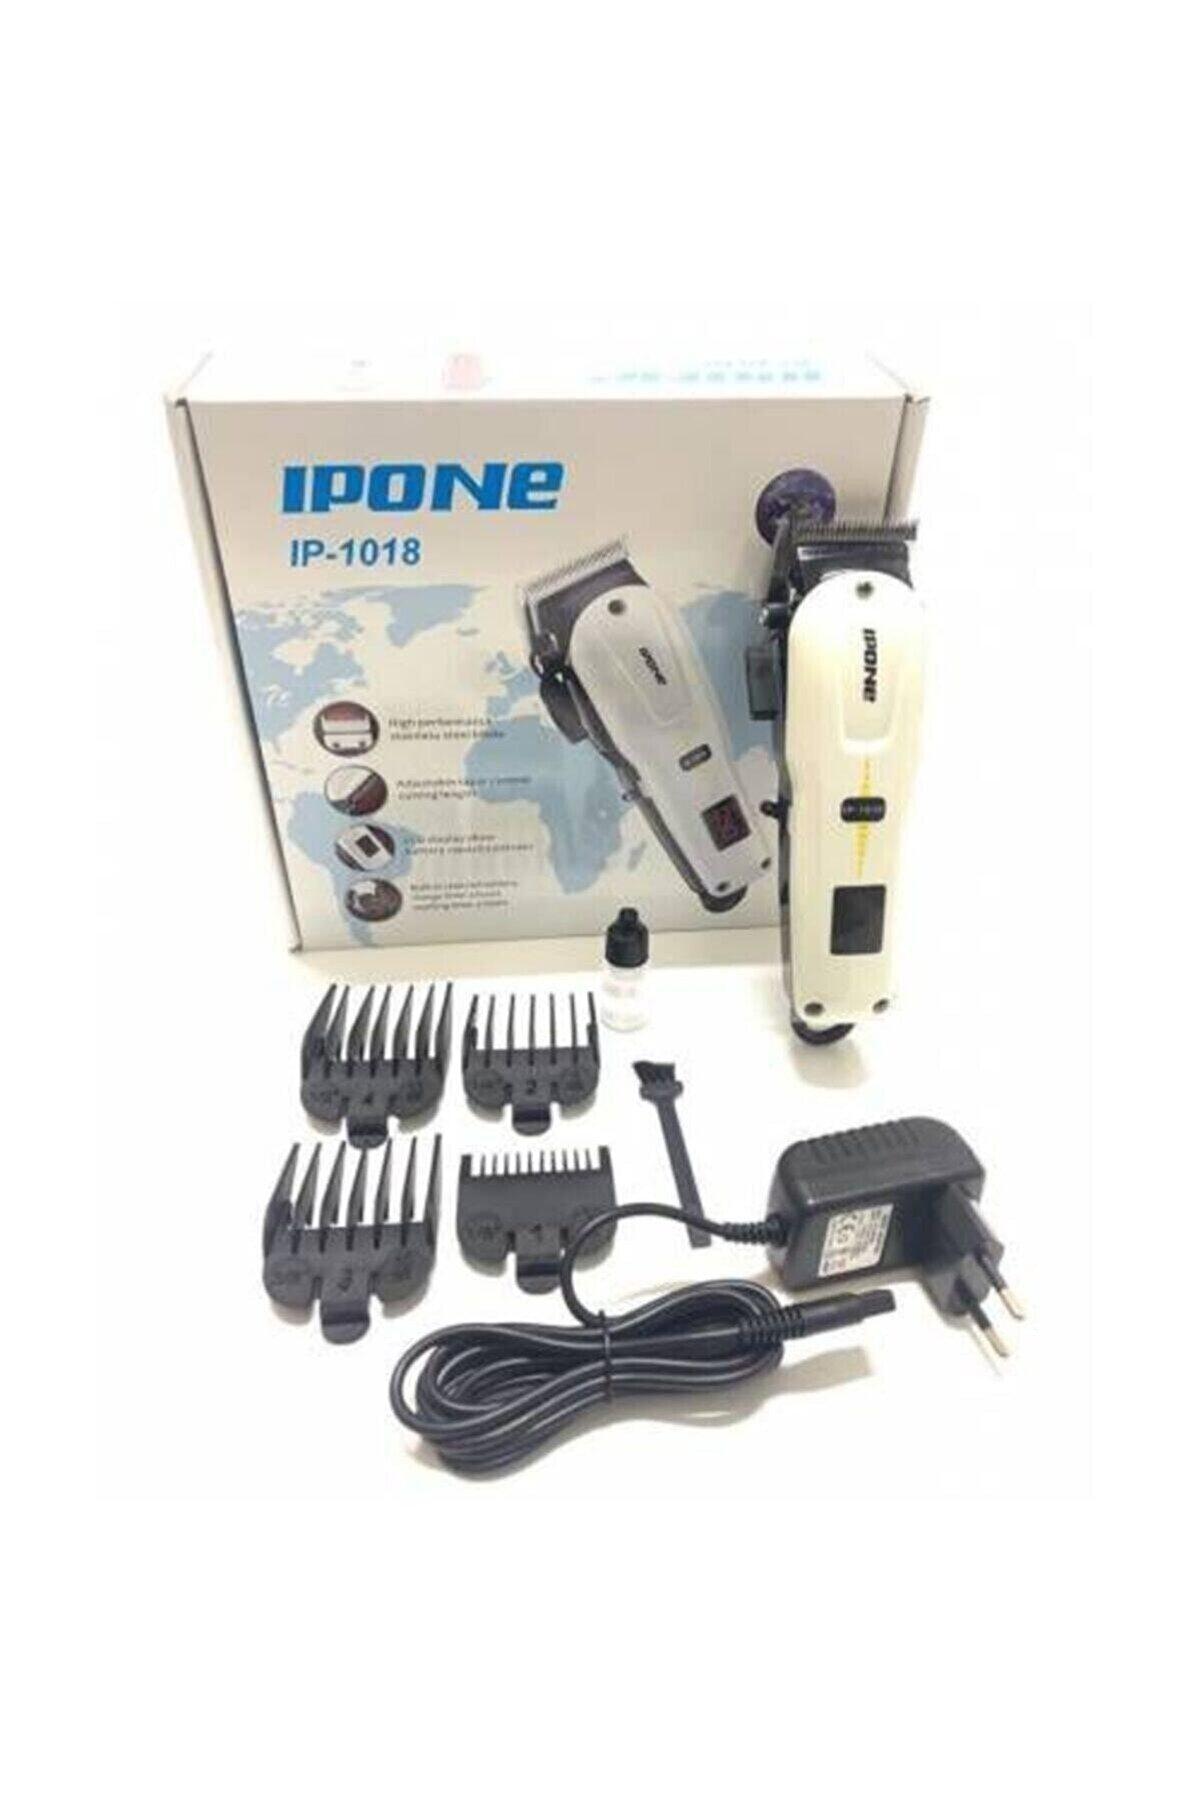 Ipone Ip-1018 Professional Saç Sakal Traş Makinesi Uzman Işi